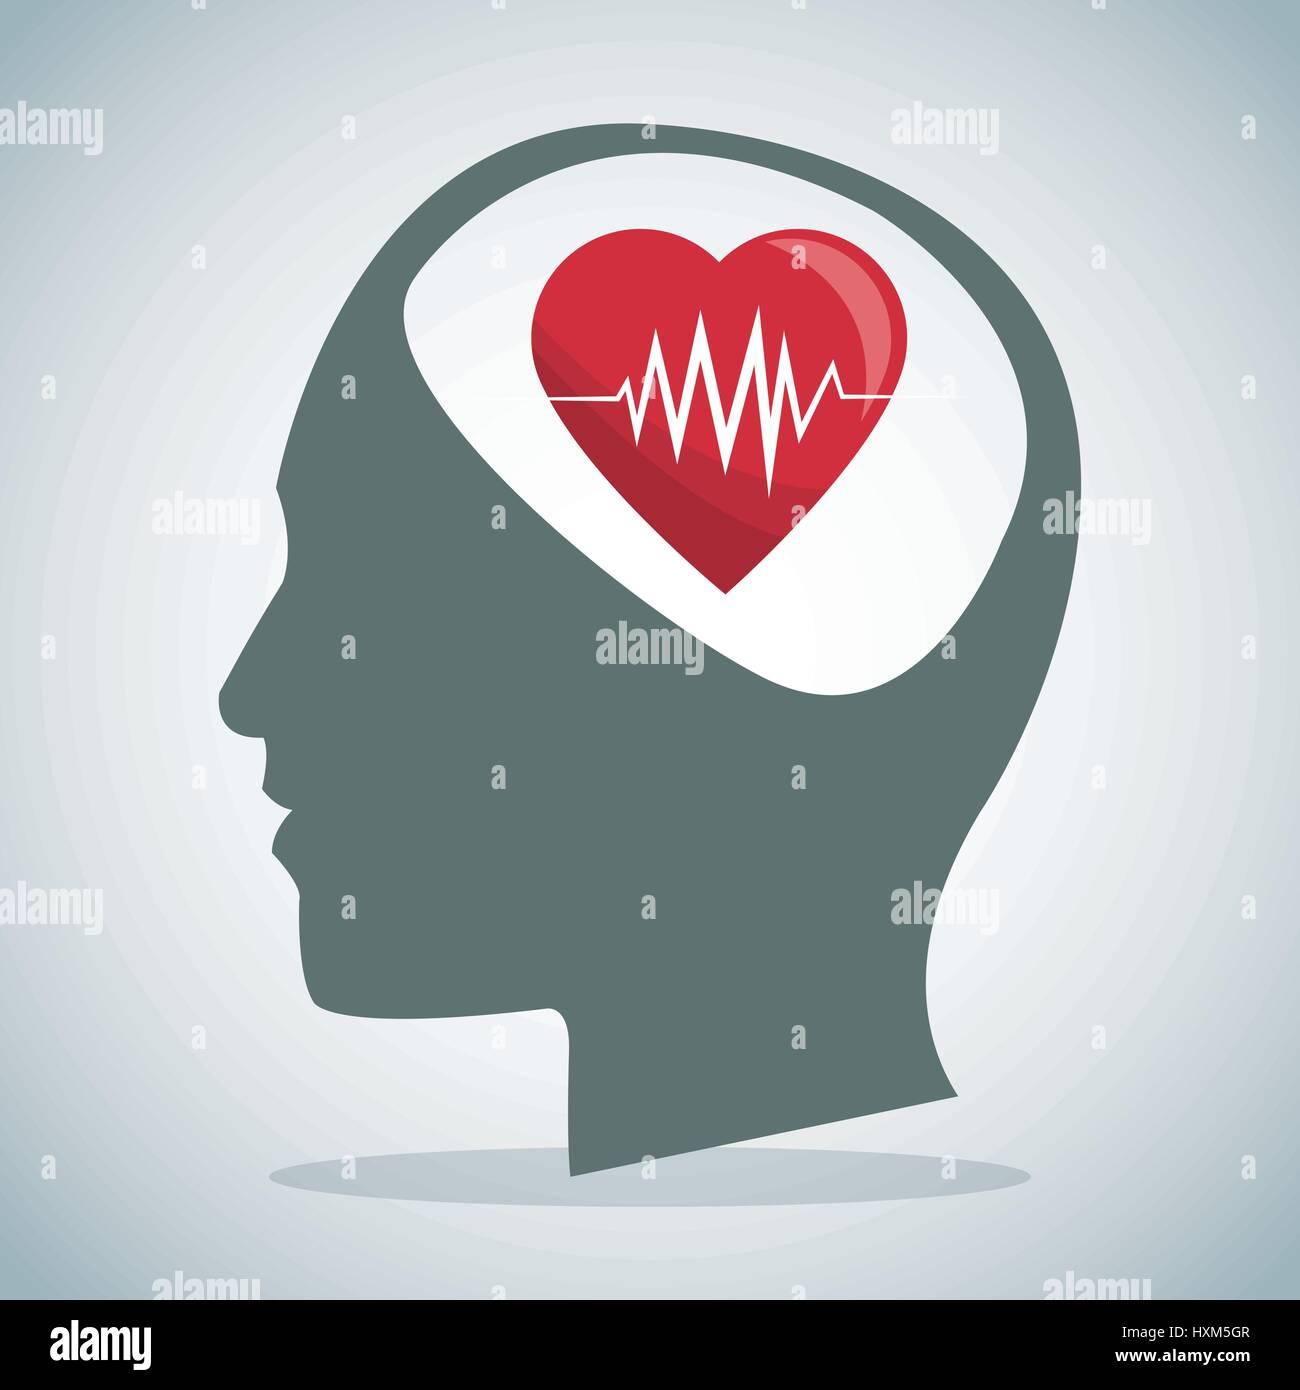 human head brain heartbeat care - Stock Image